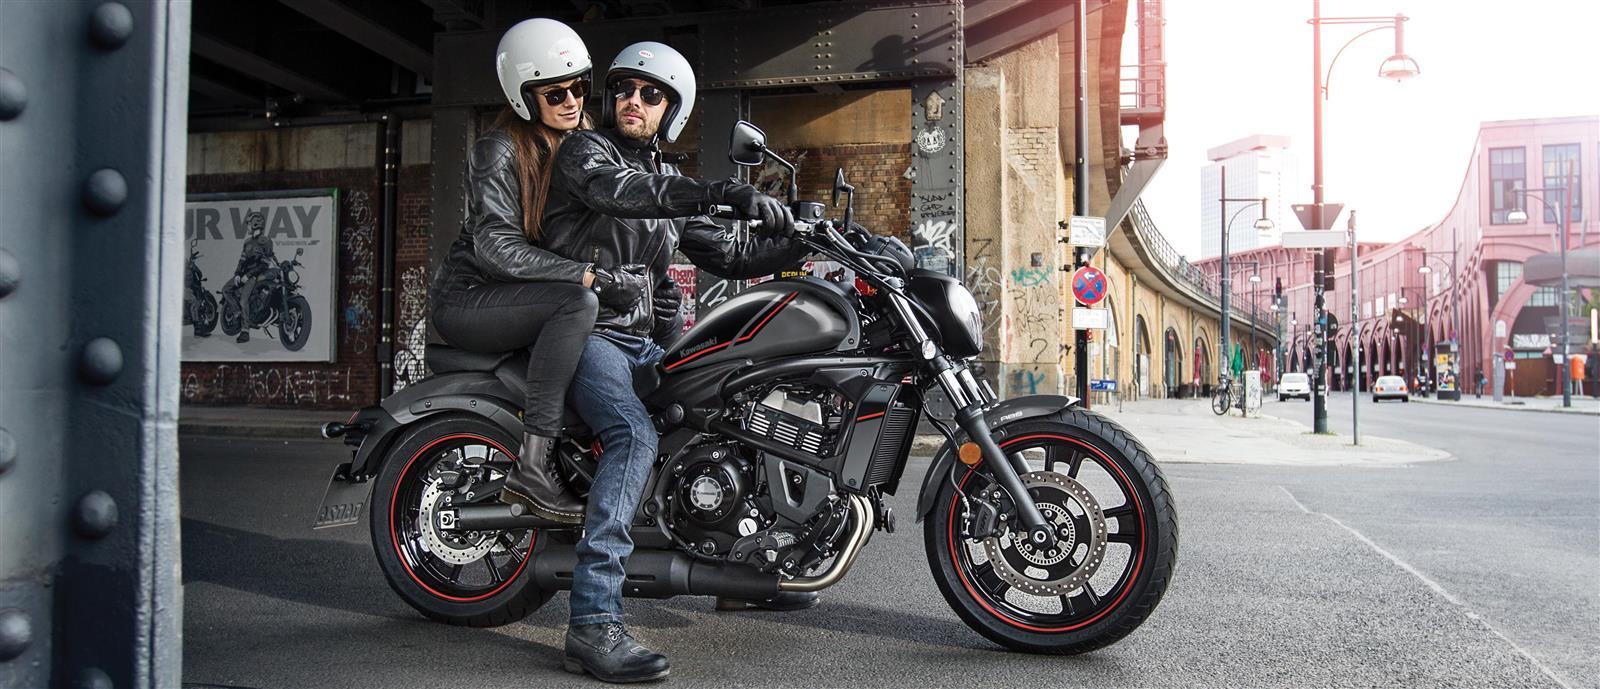 motocyklowa fabryka adrenaliny motocykle kawasaki polska